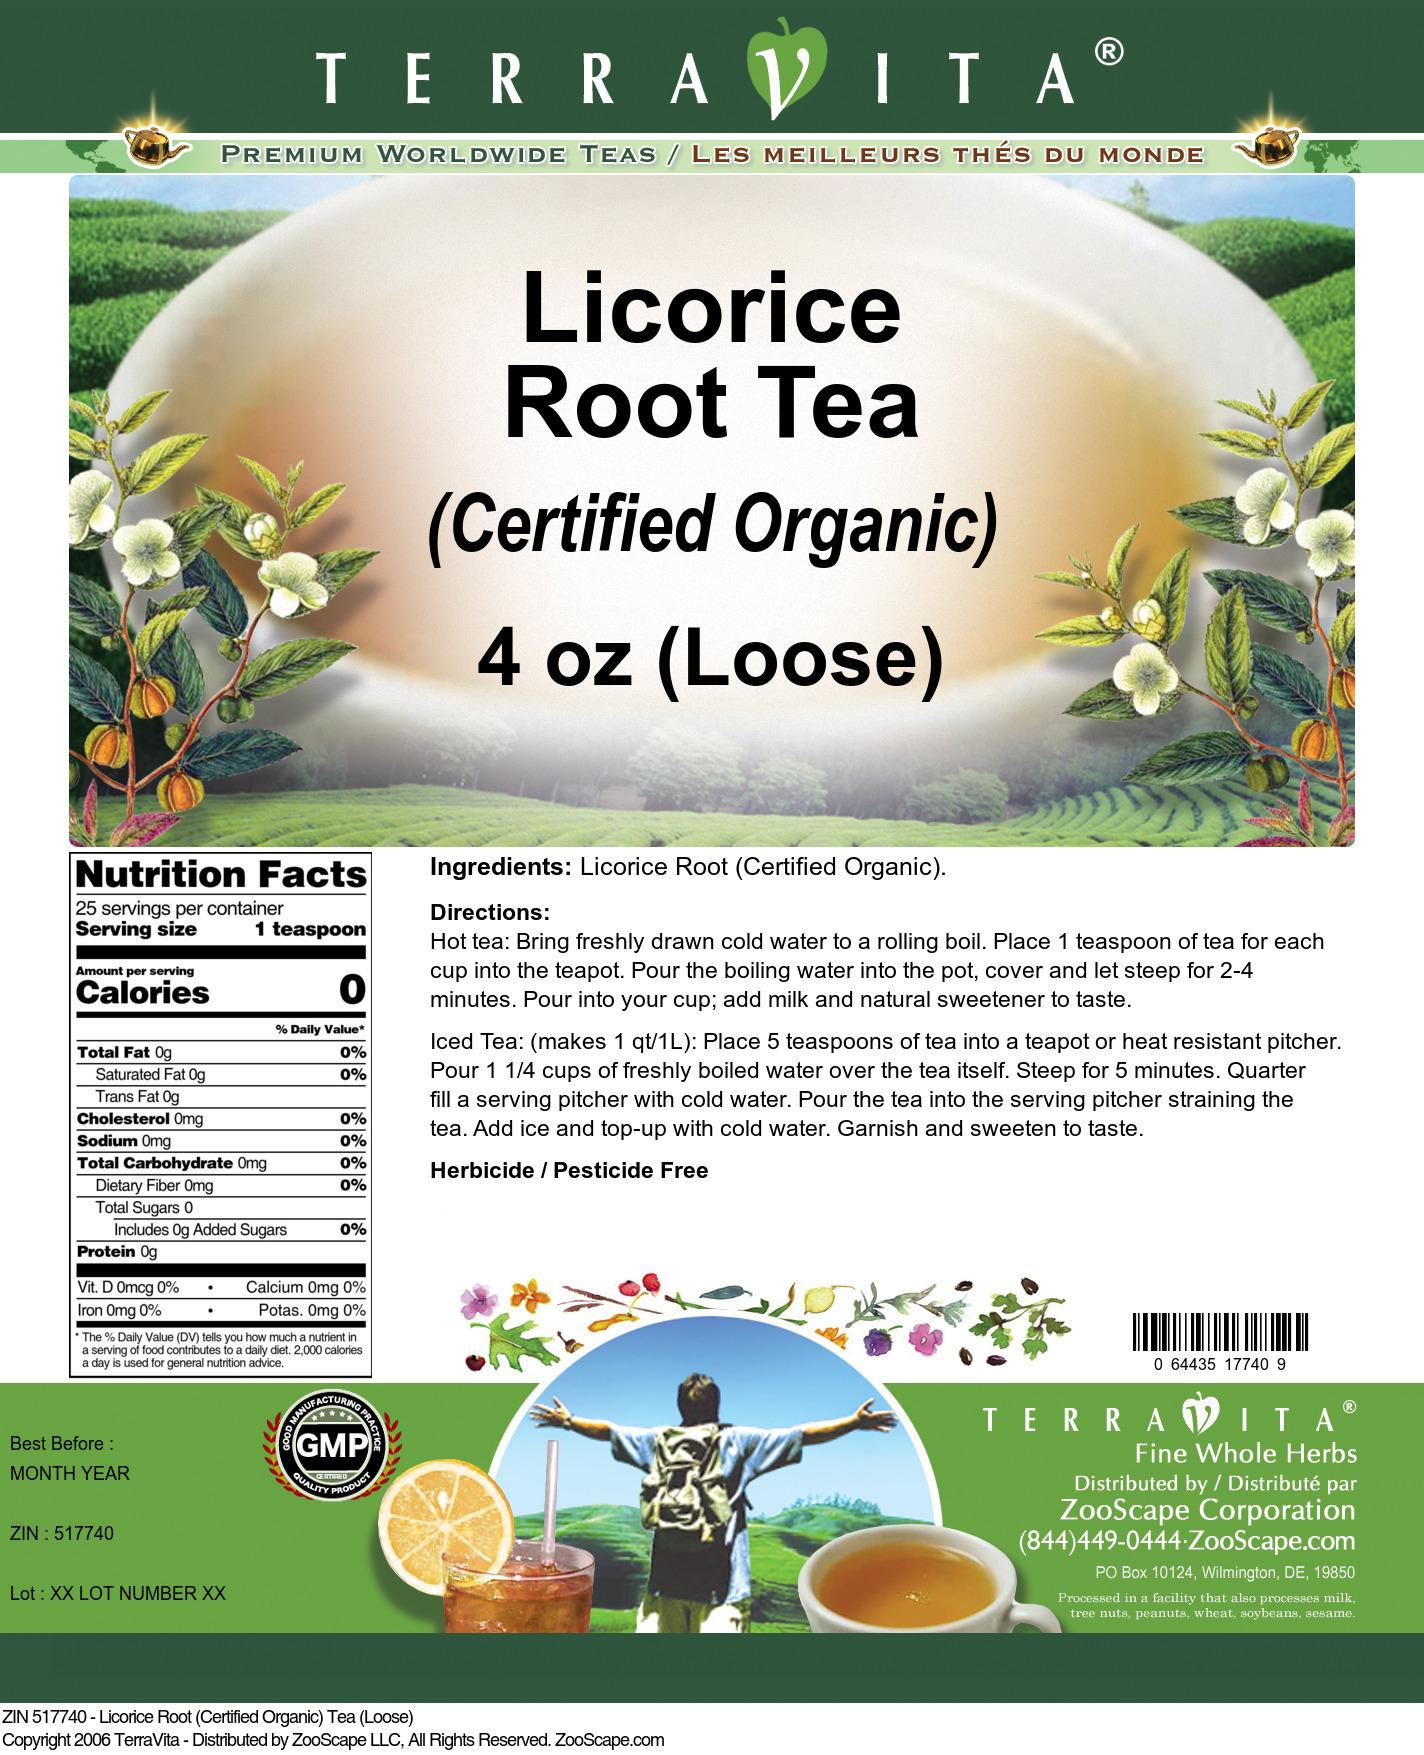 Licorice Root (Certified Organic) Tea (Loose)